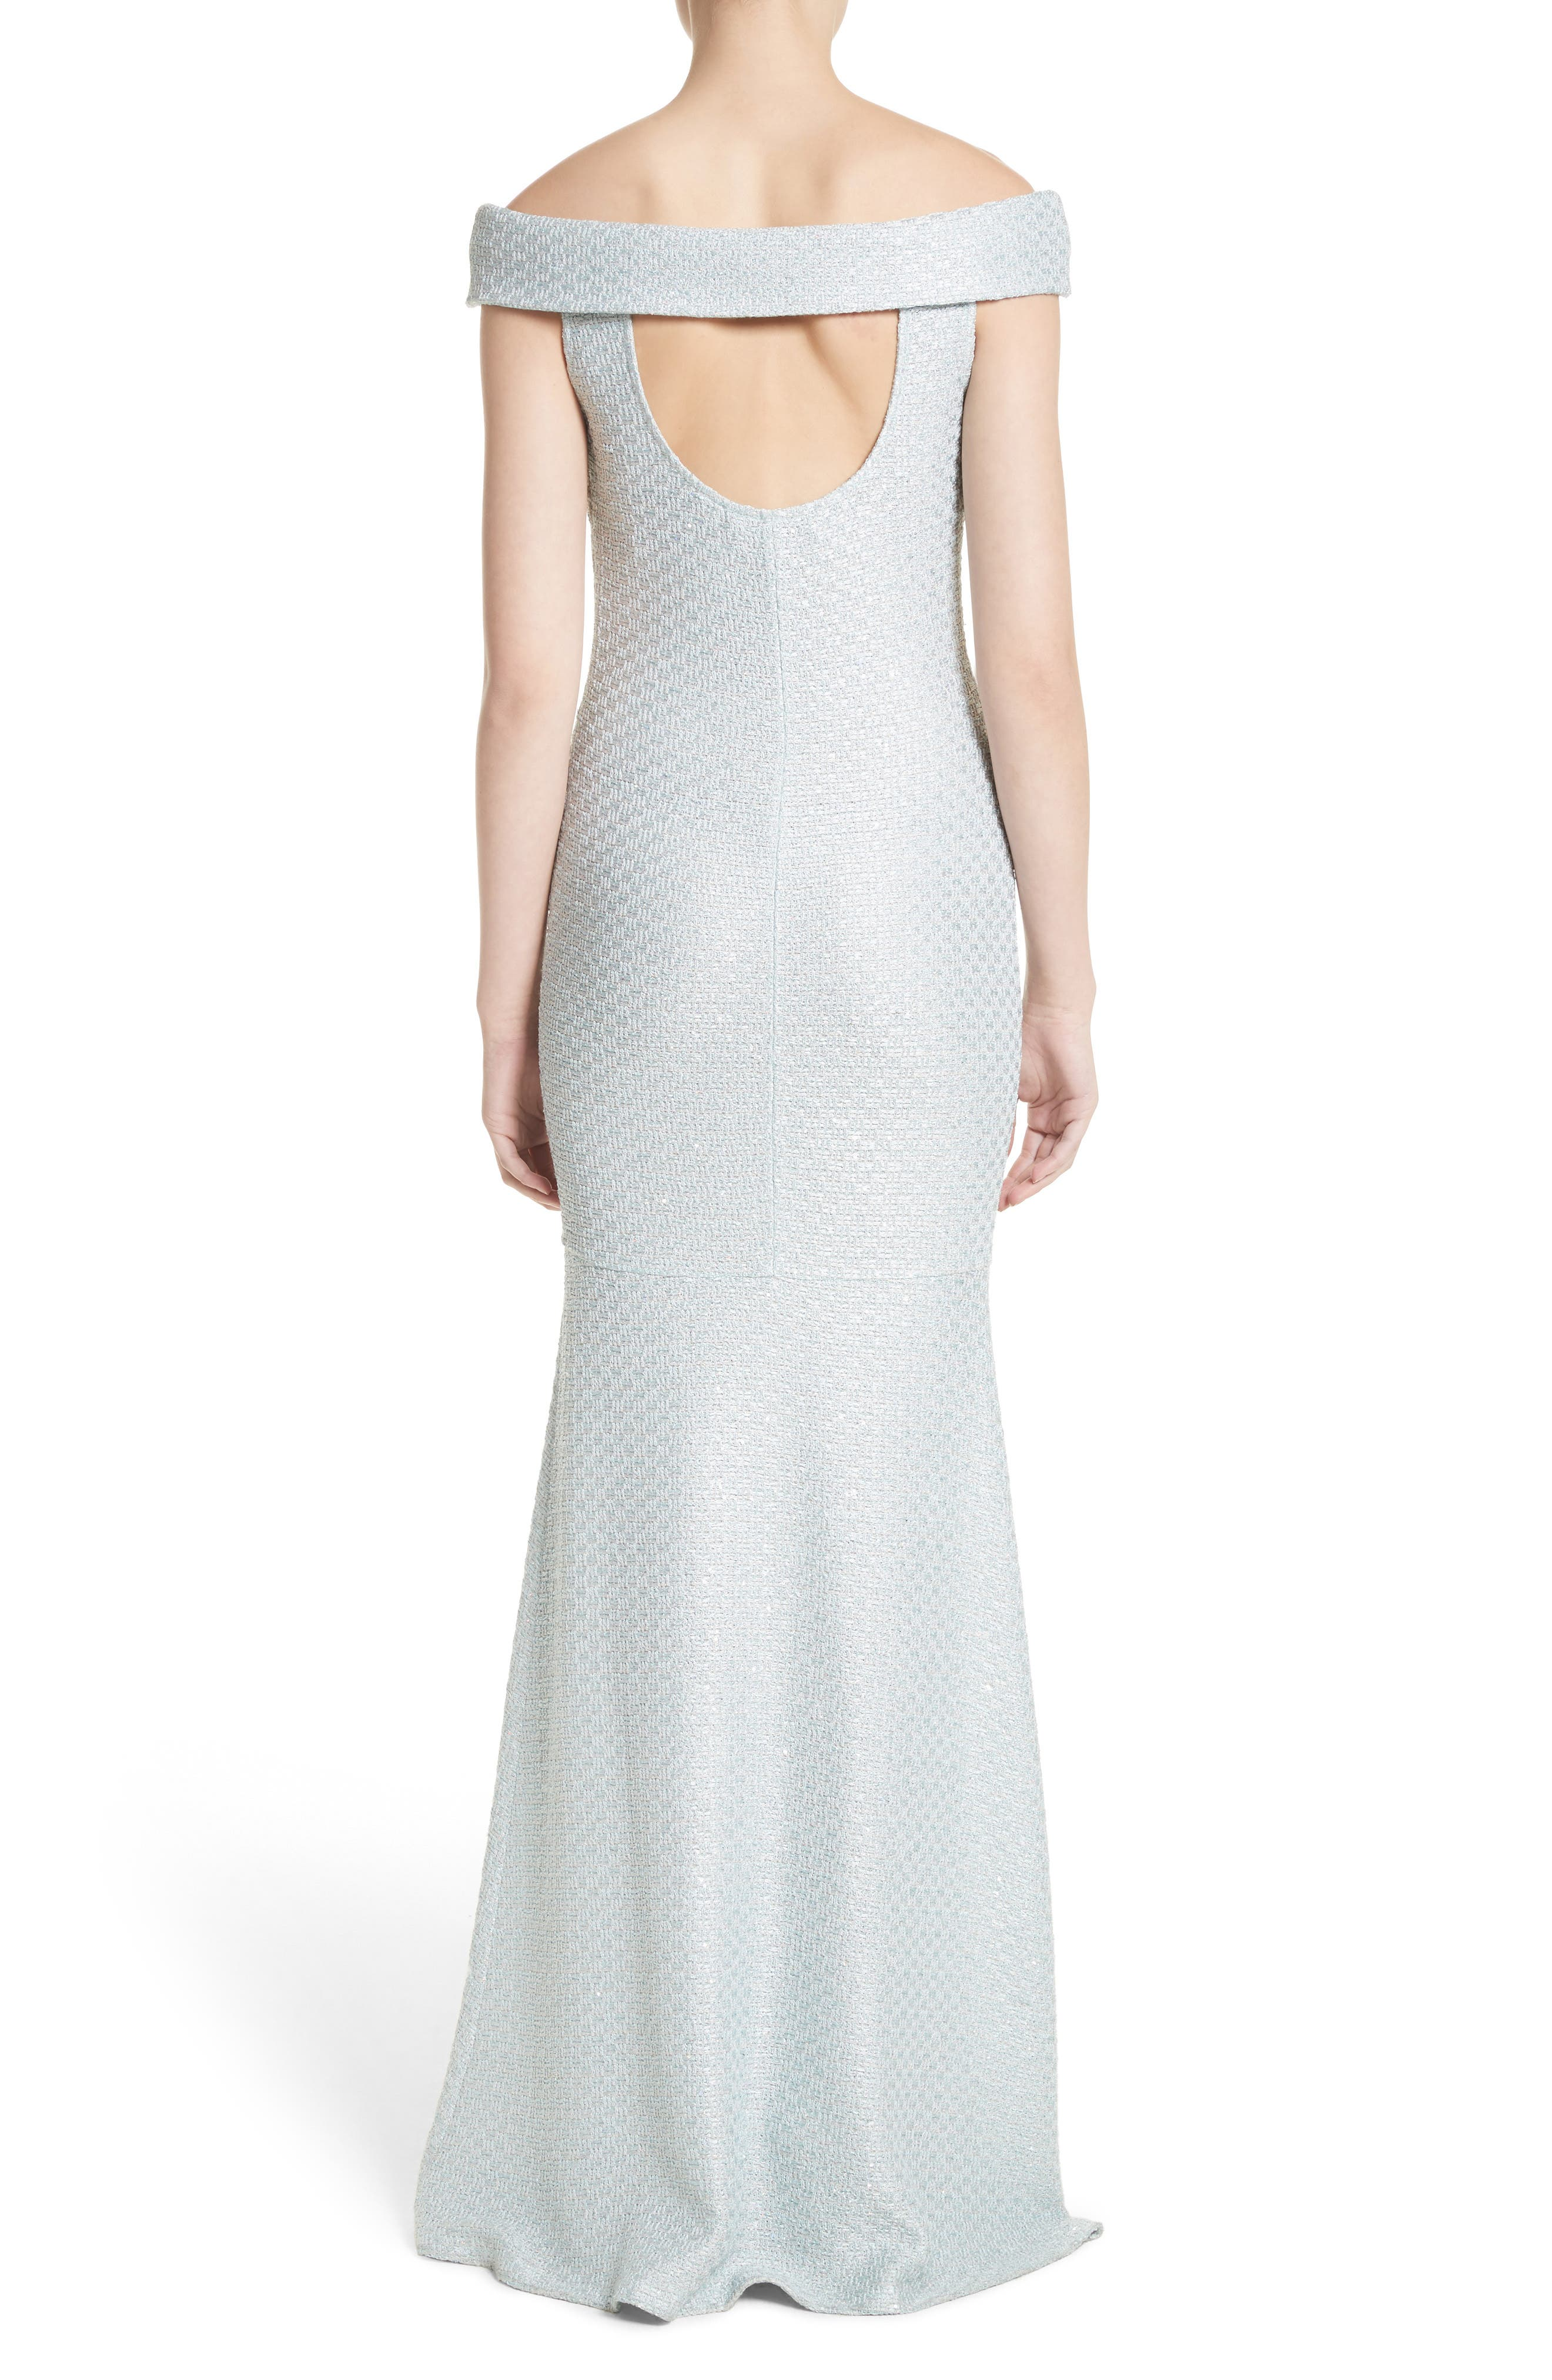 Alternate Image 3  - St. John Evening Hansh Sequin Knit Off the Shoulder Gown